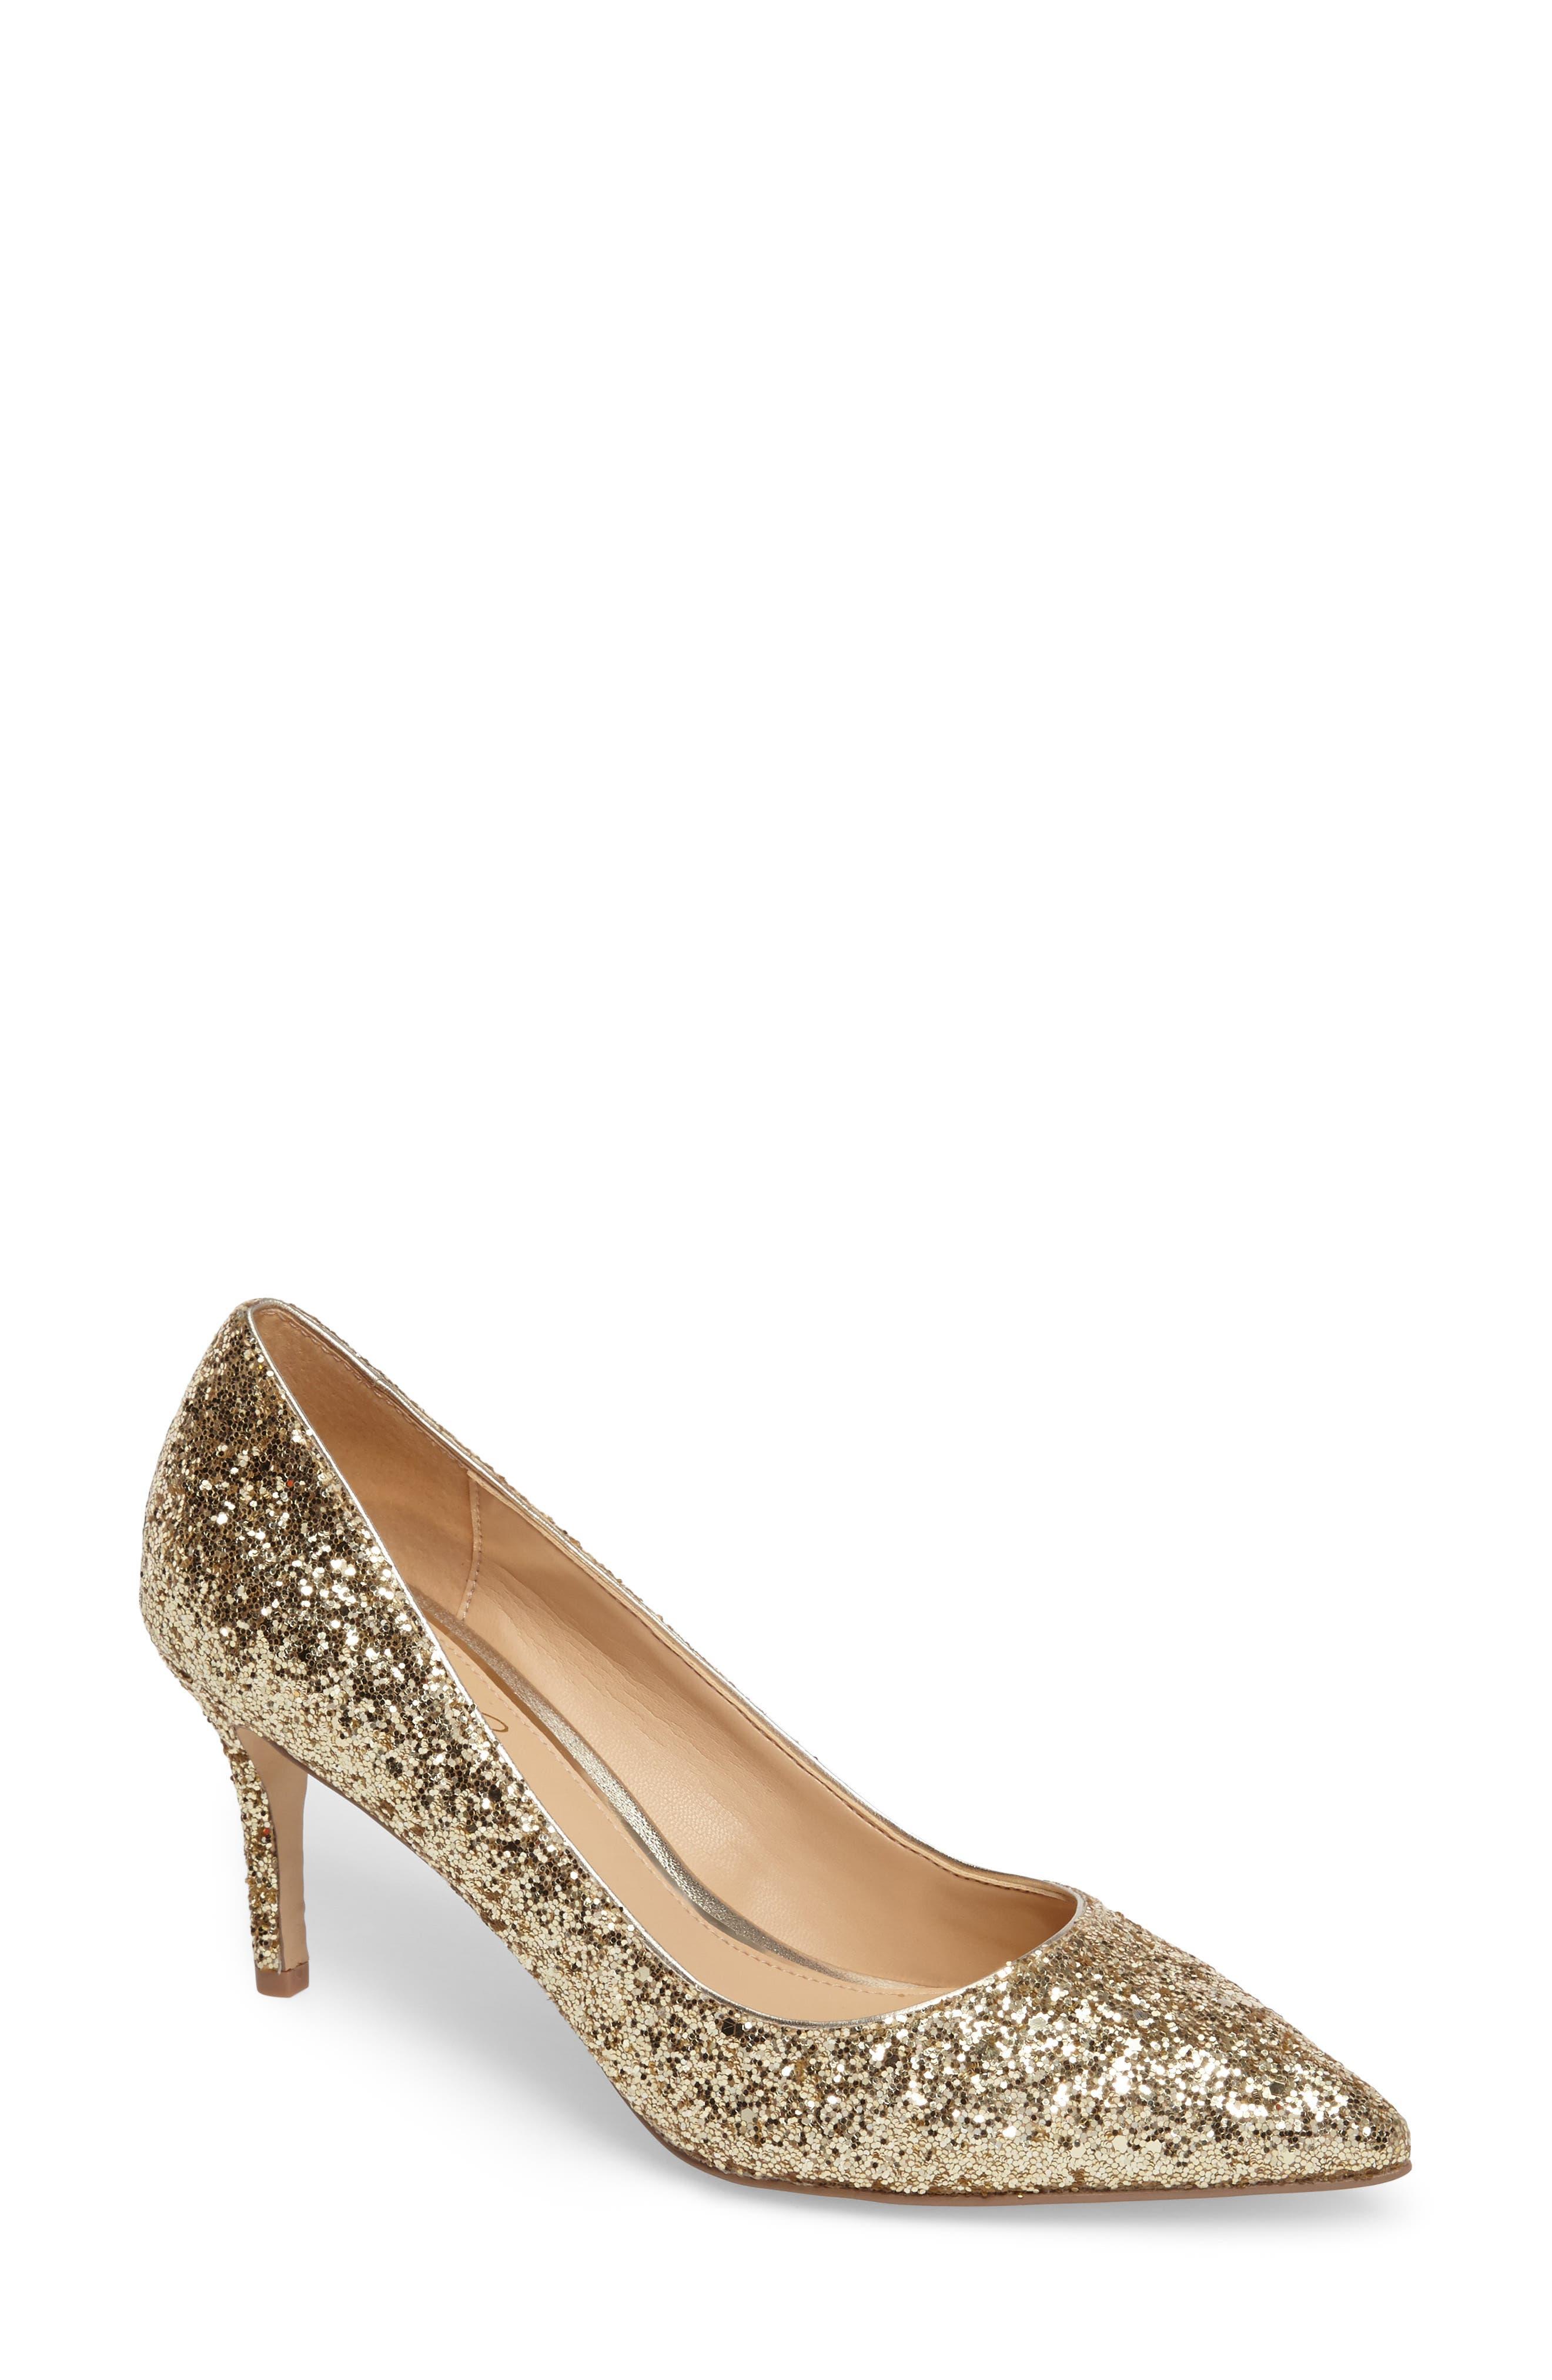 Lyla Glitter Pointy Toe Pump,                         Main,                         color, Gold